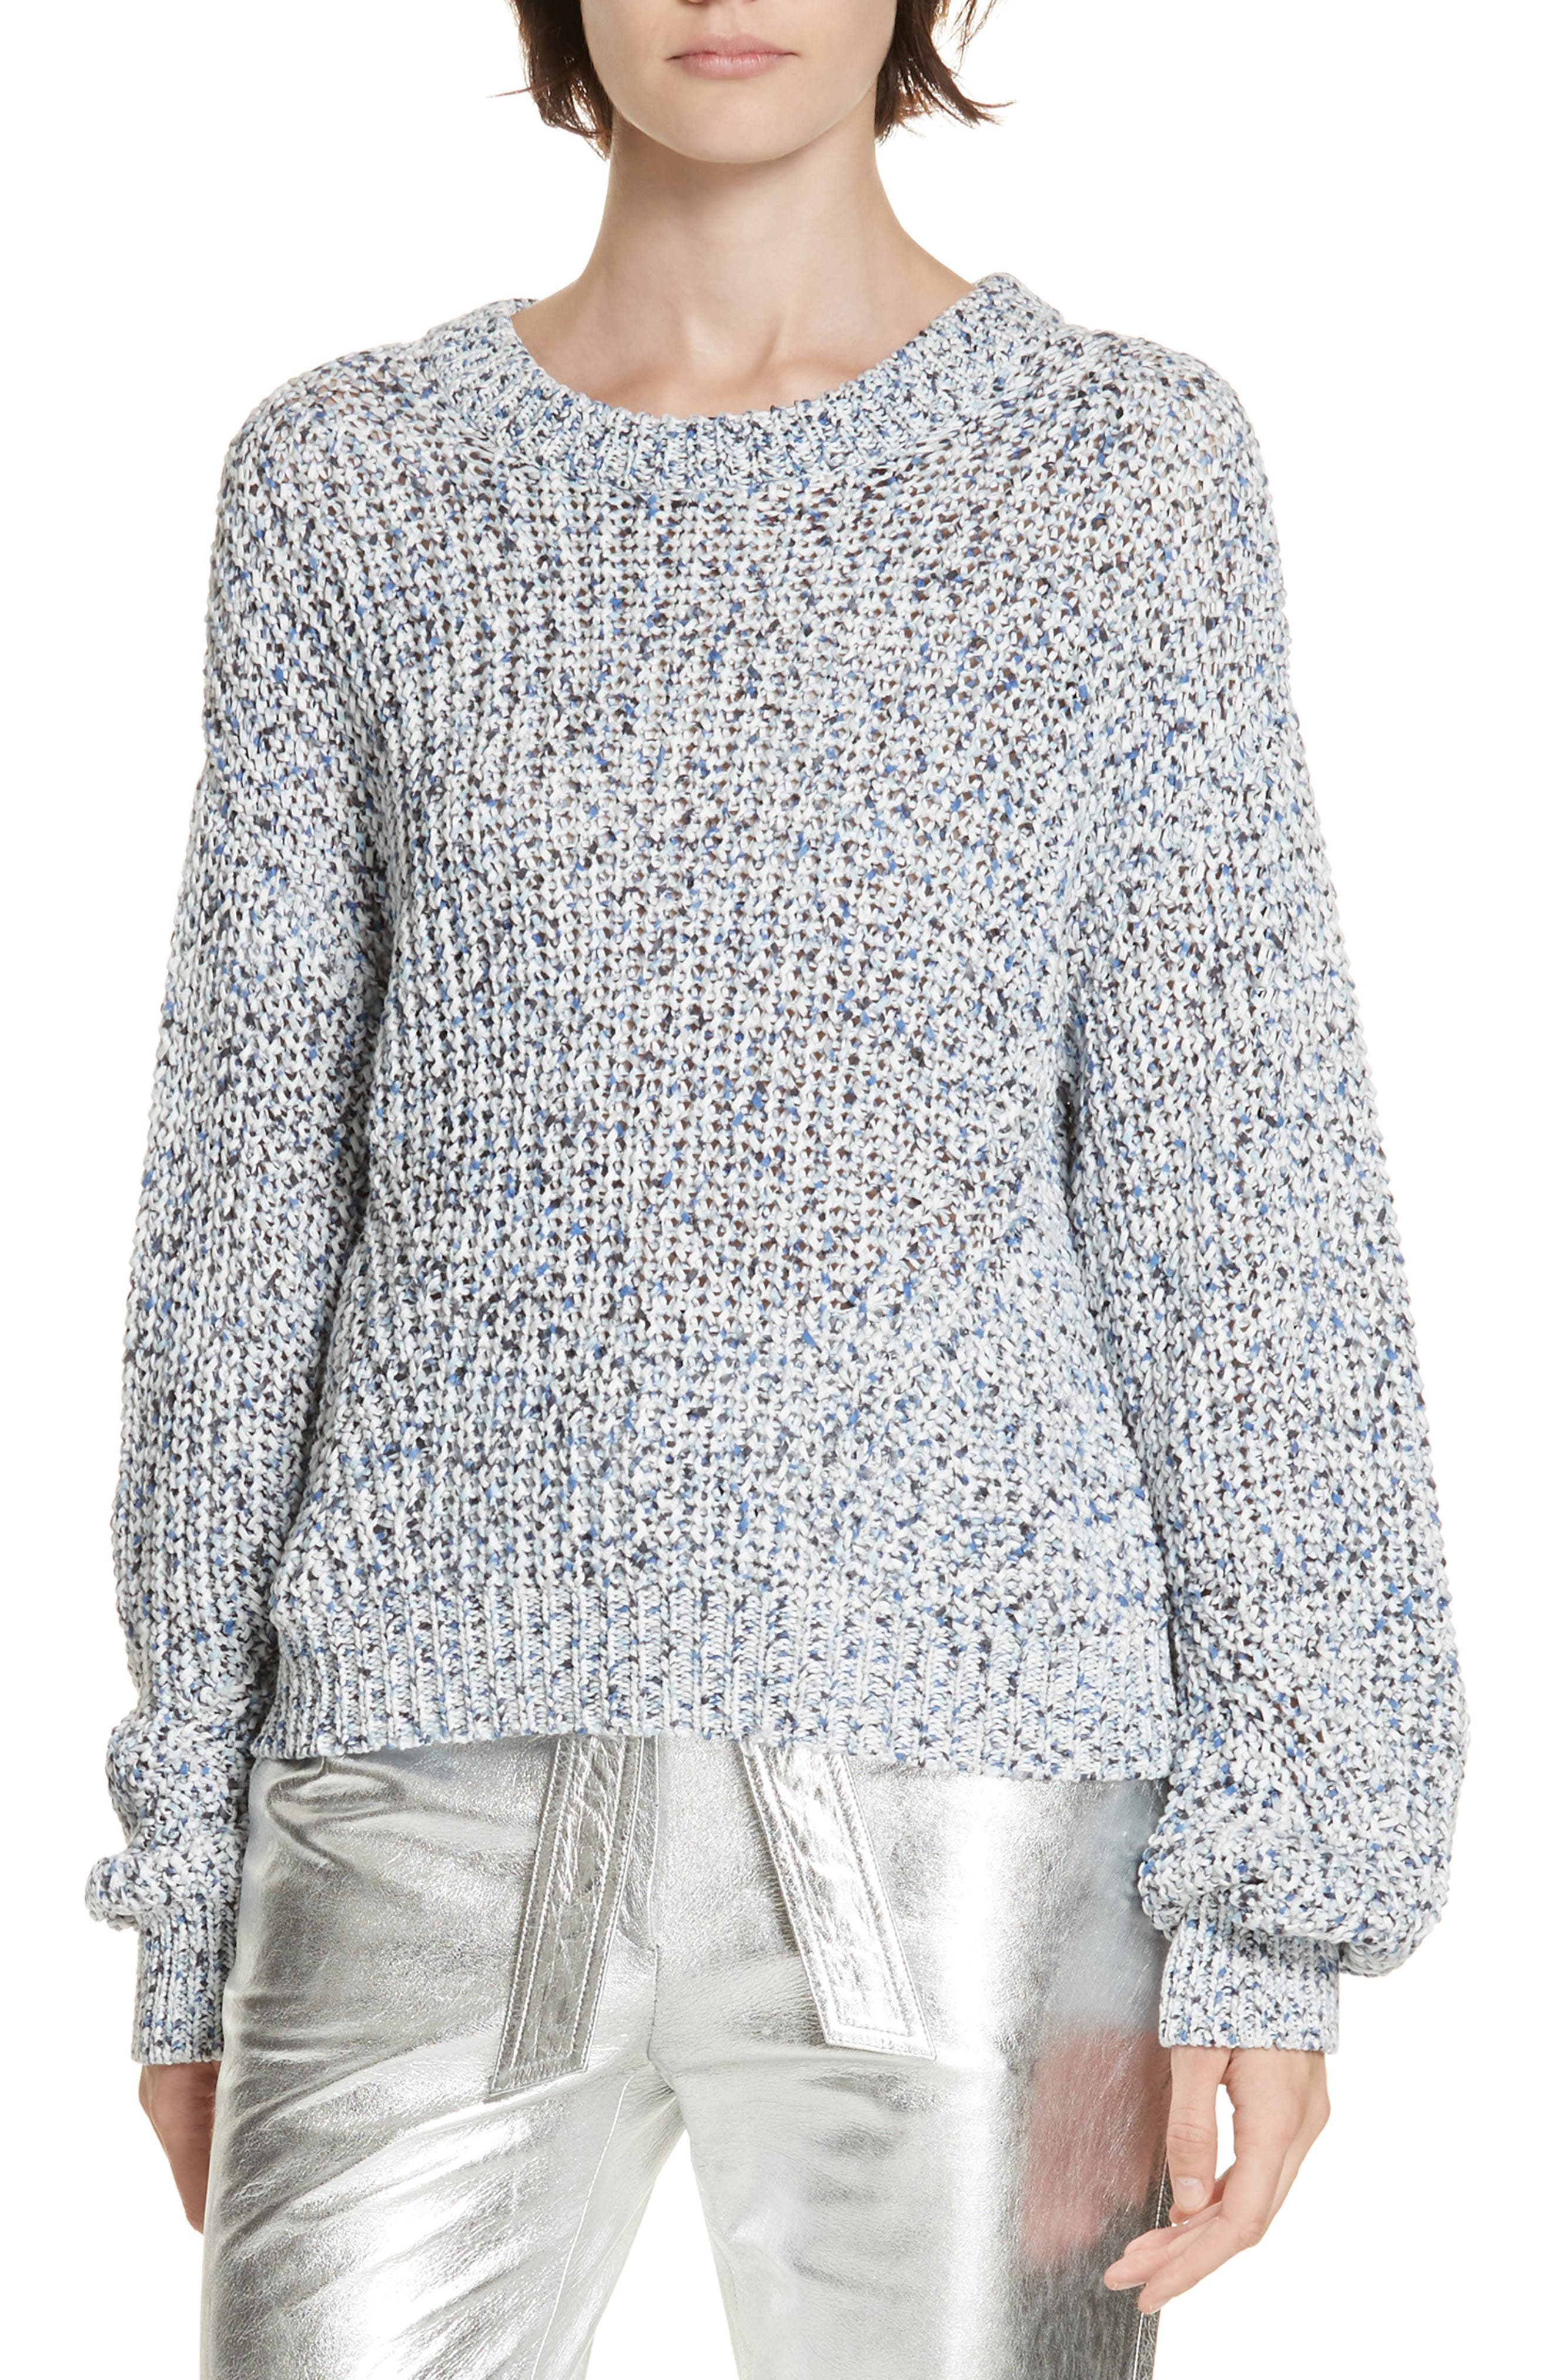 Ryce Cotton Sweater,                             Main thumbnail 1, color,                             BLUE MULIT